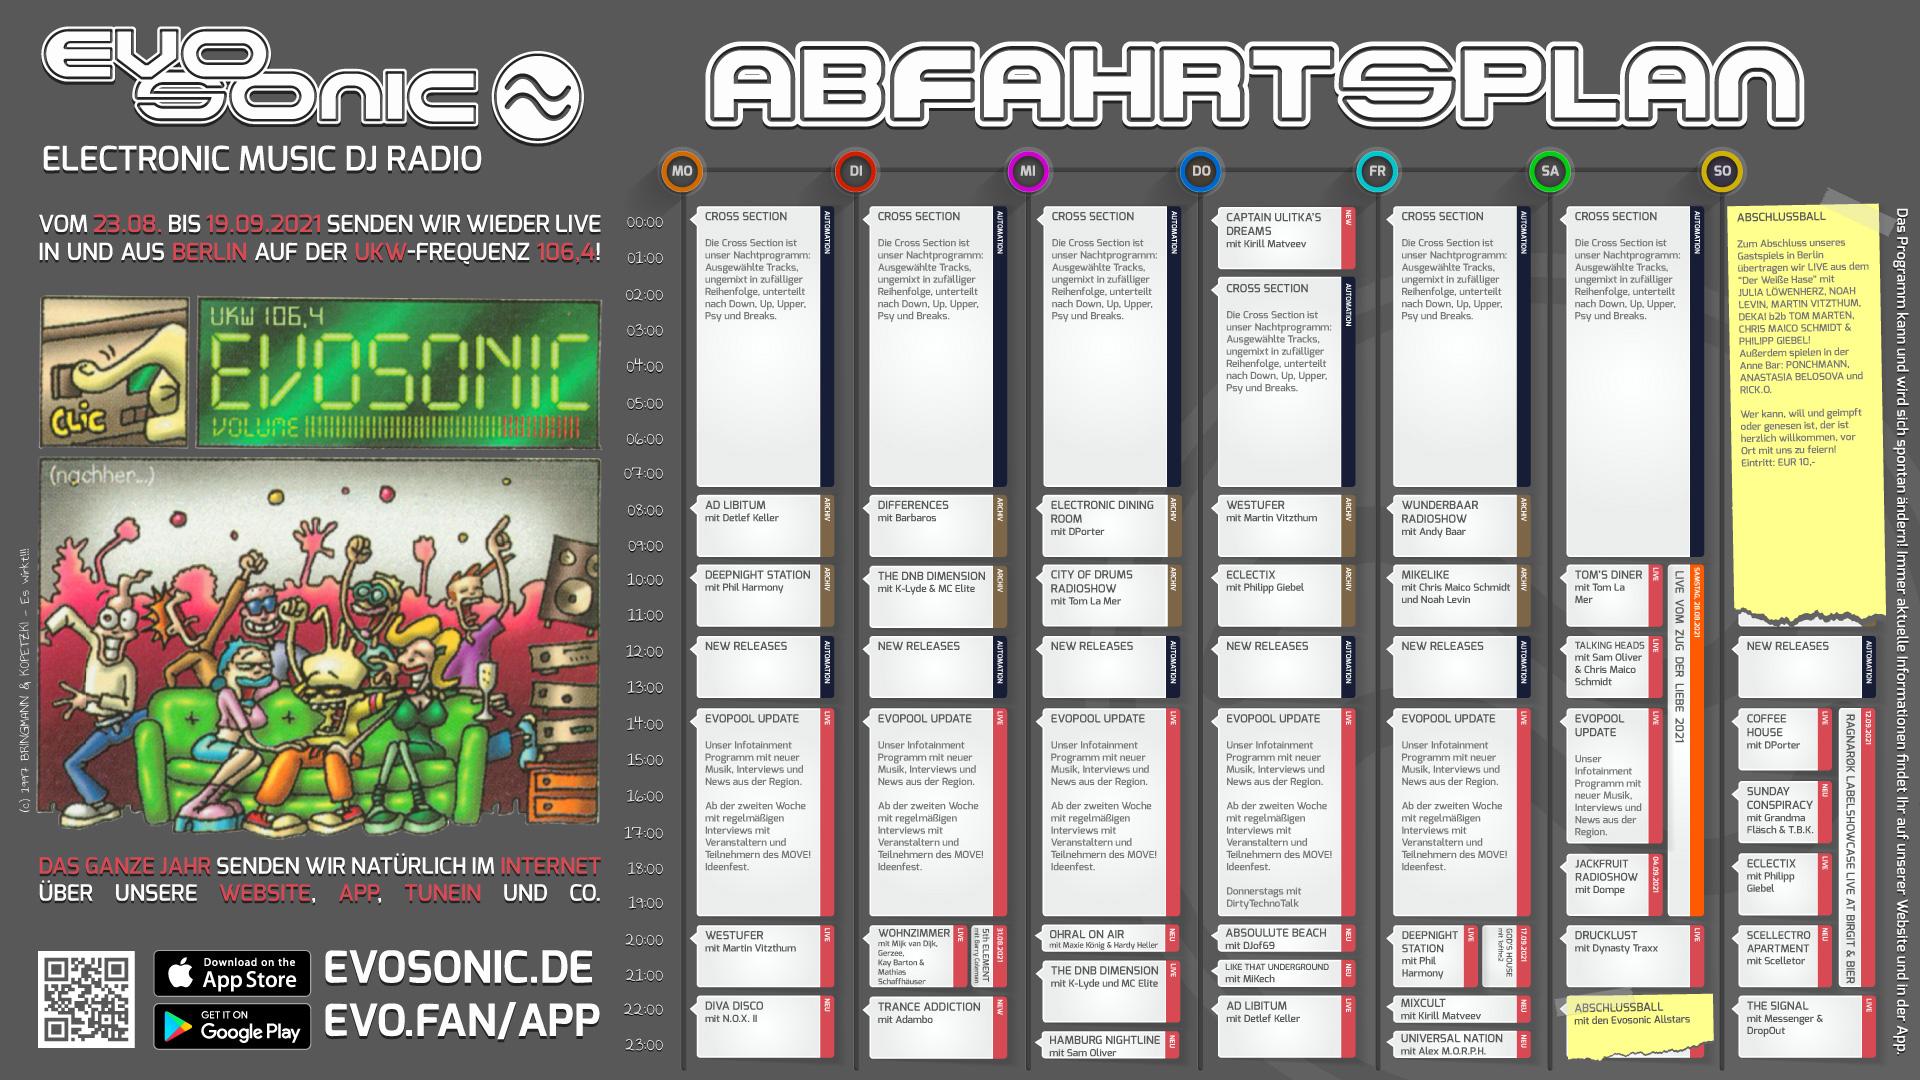 EVOSONIC Live aus Berlin – Woche 4